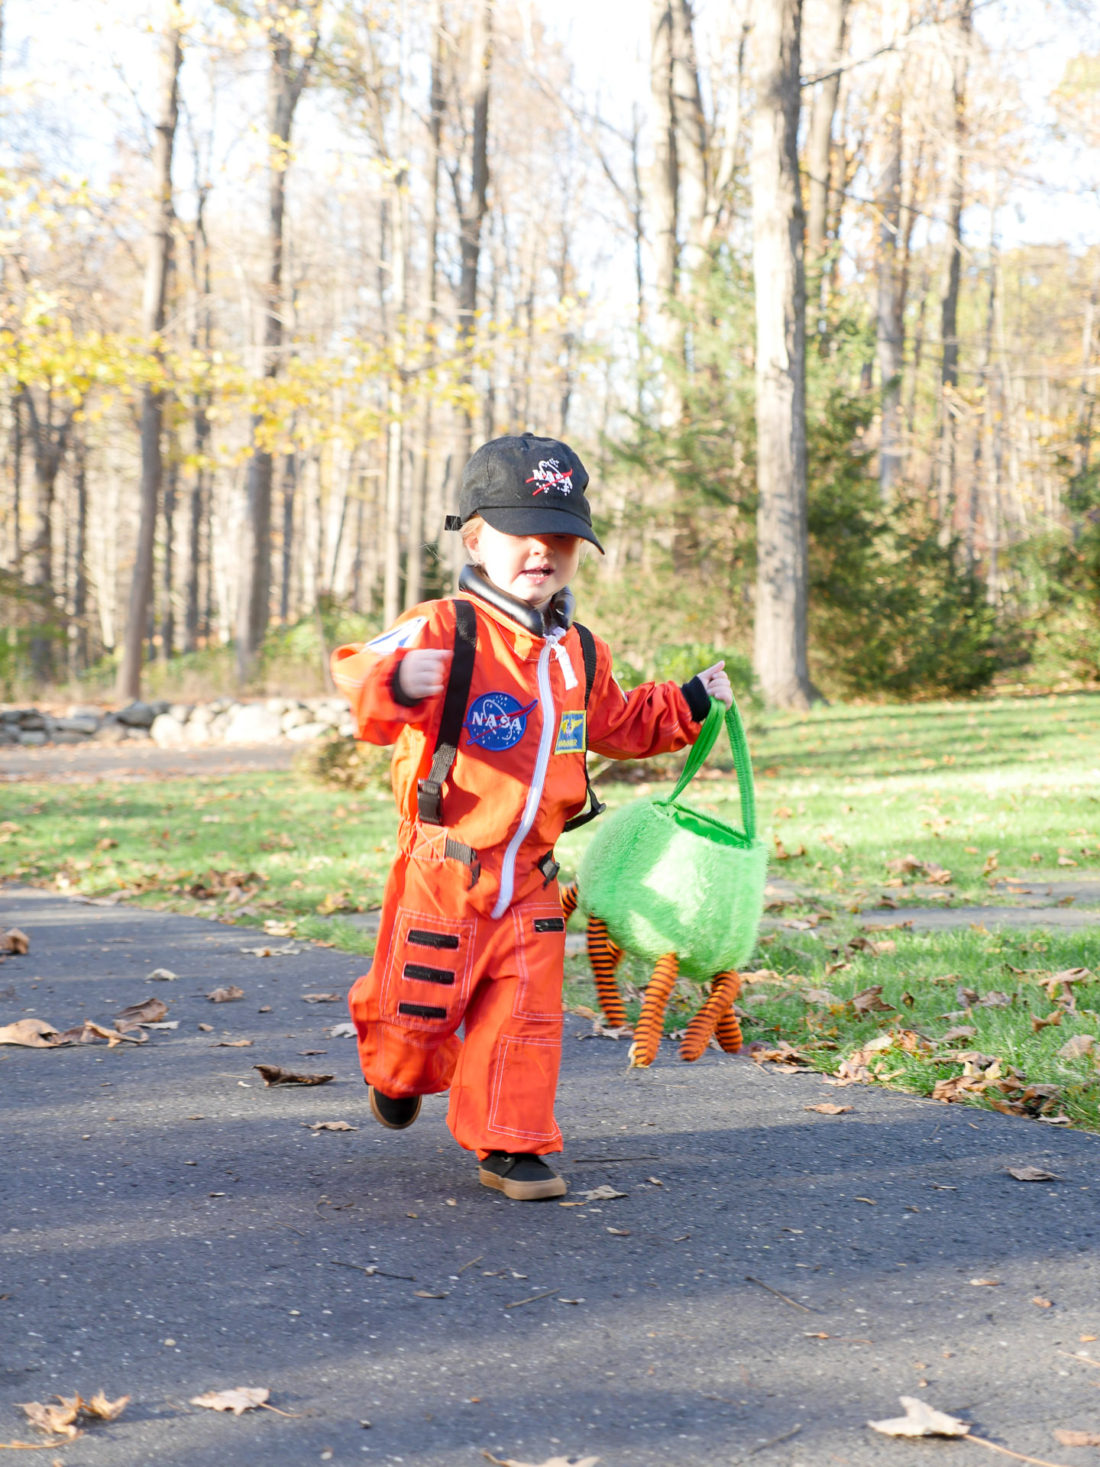 Marlowe Martino dressed as an Astronaut for Halloween